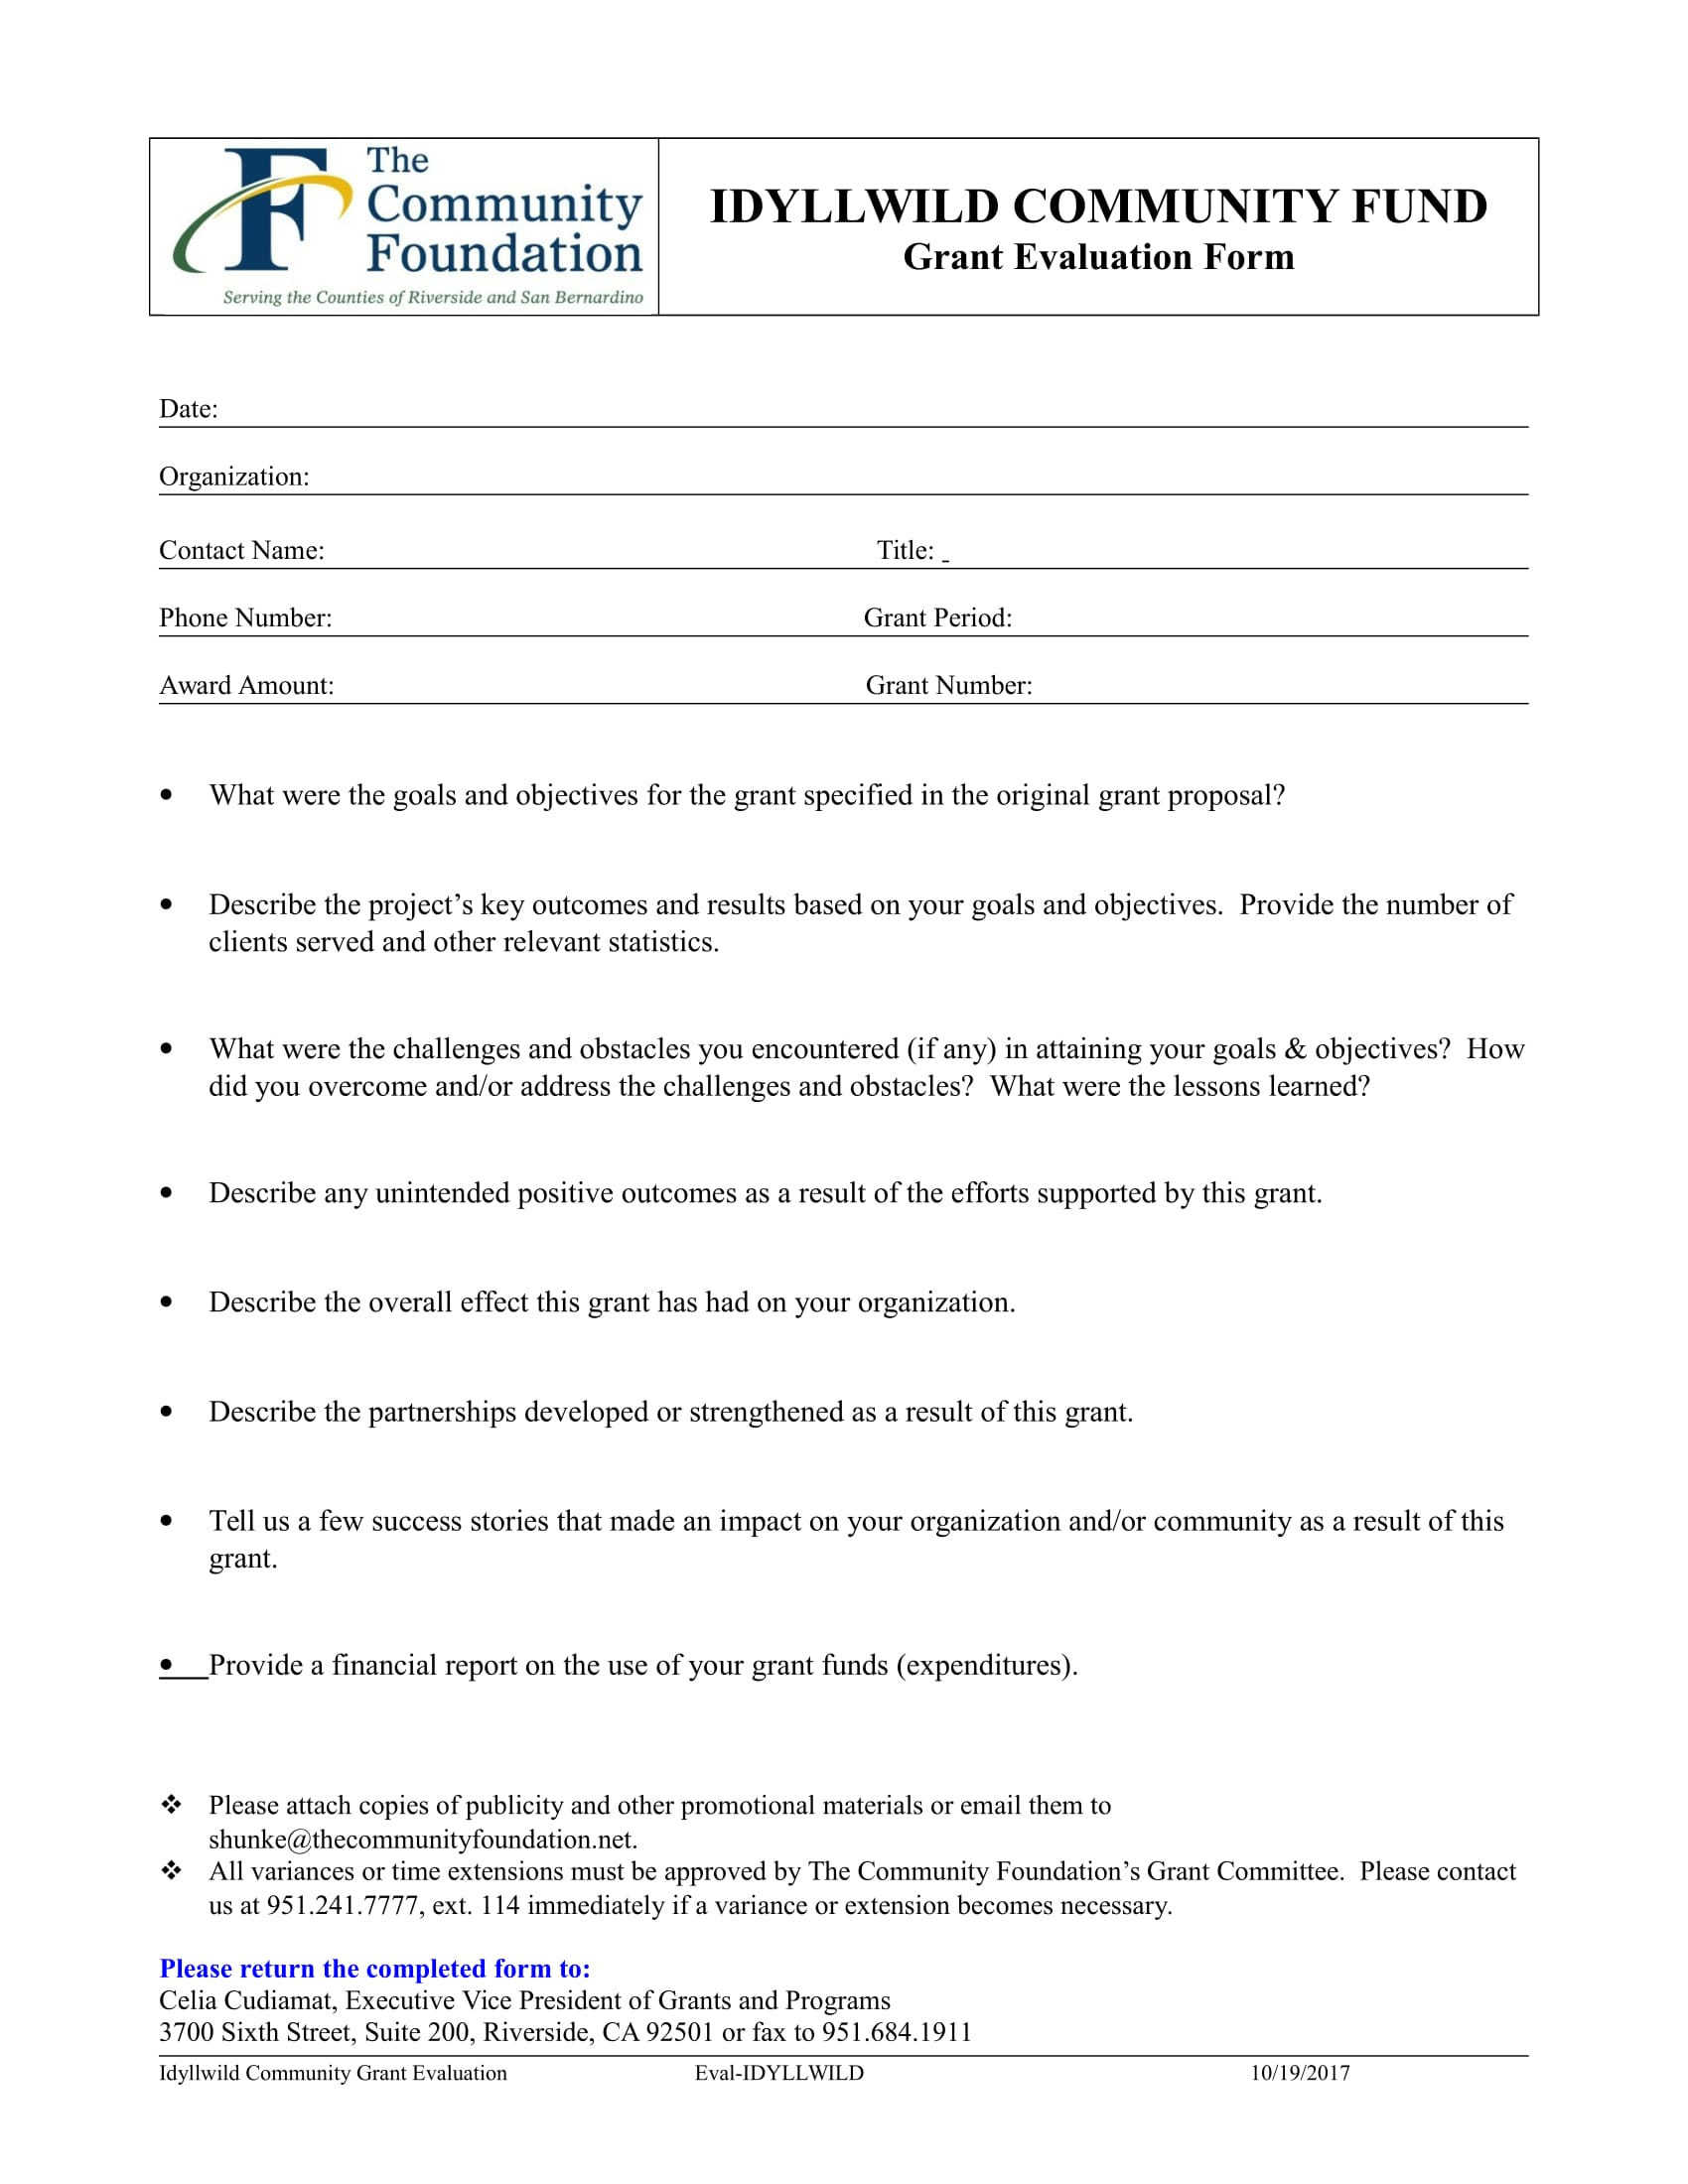 fund grant evaluation form 1